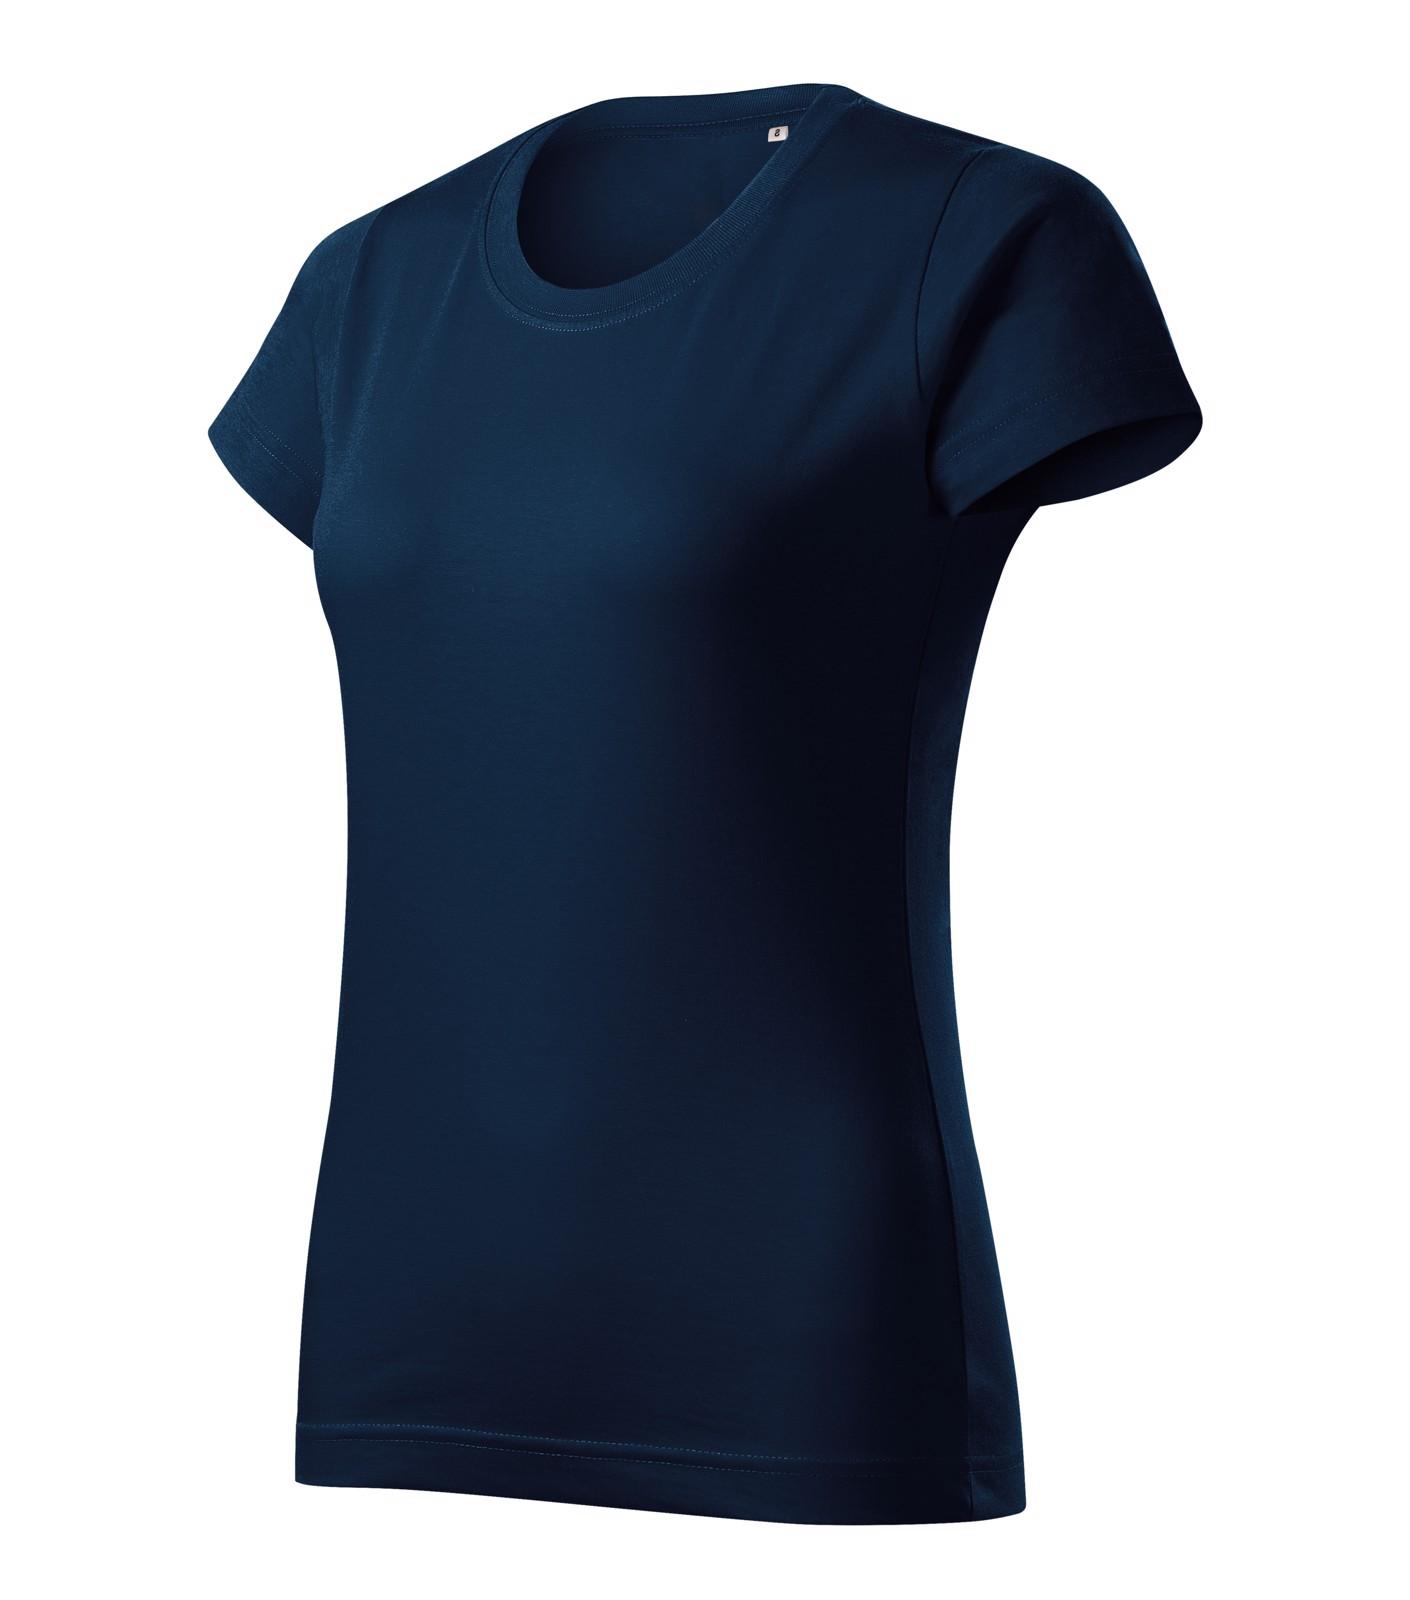 T-shirt women's Malfini Basic Free - Navy Blue / 2XL